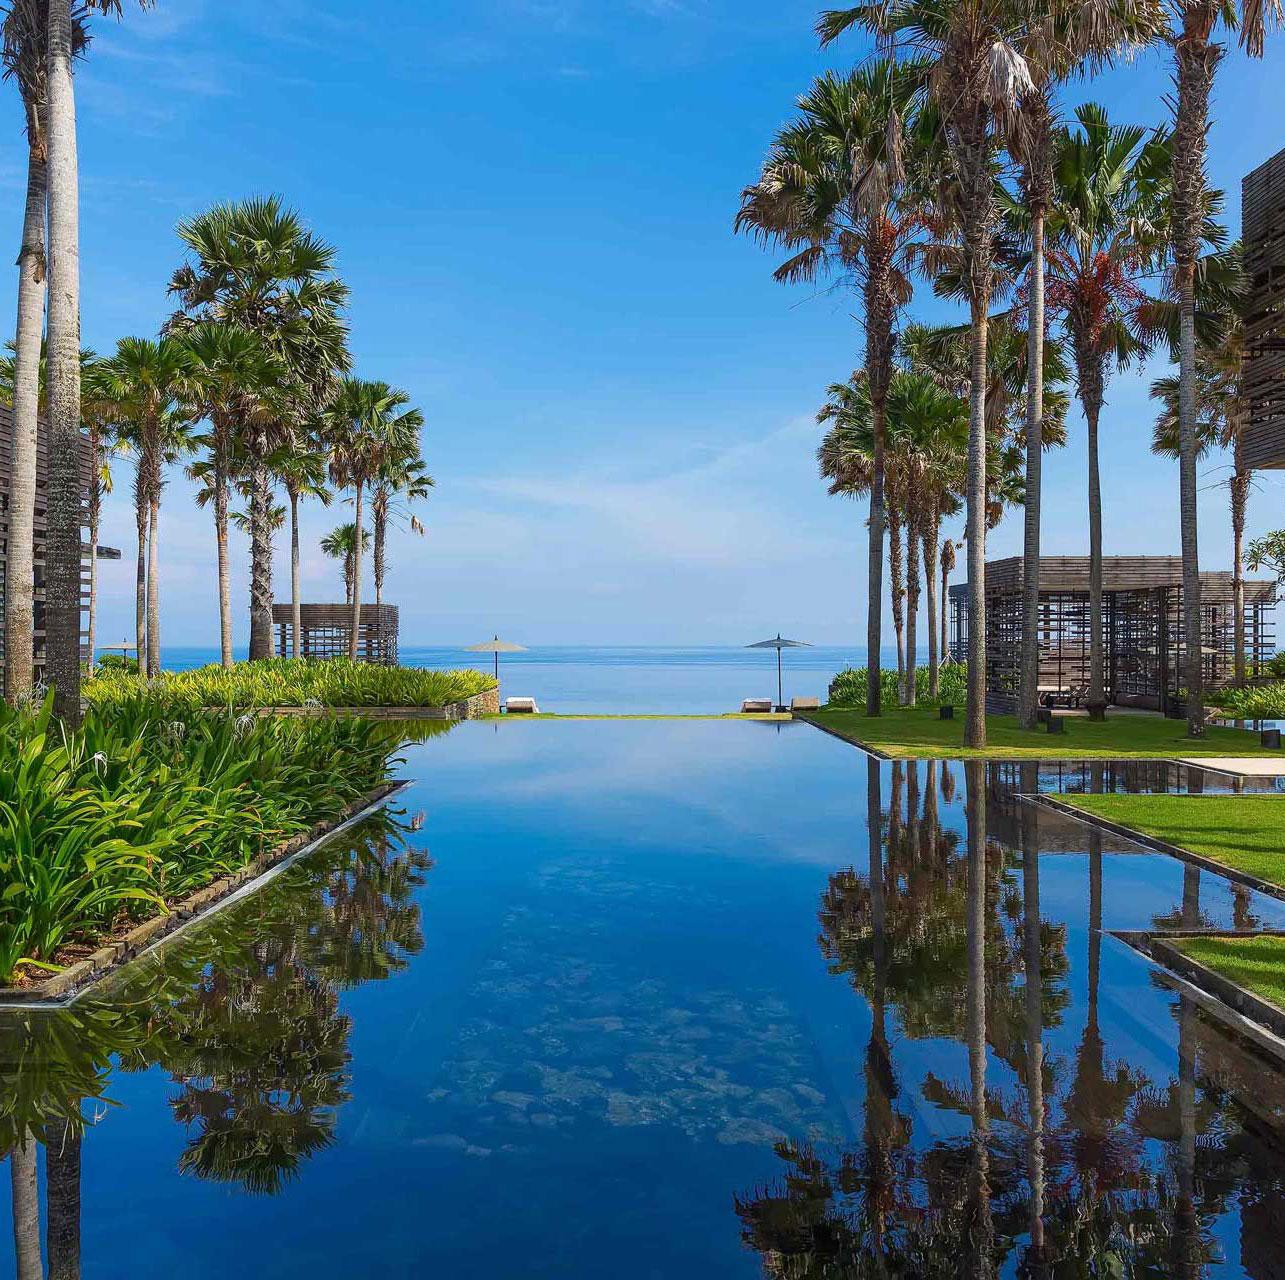 Best Honeymoon Places Bali: 20 Best Honeymoon Destinations 2019